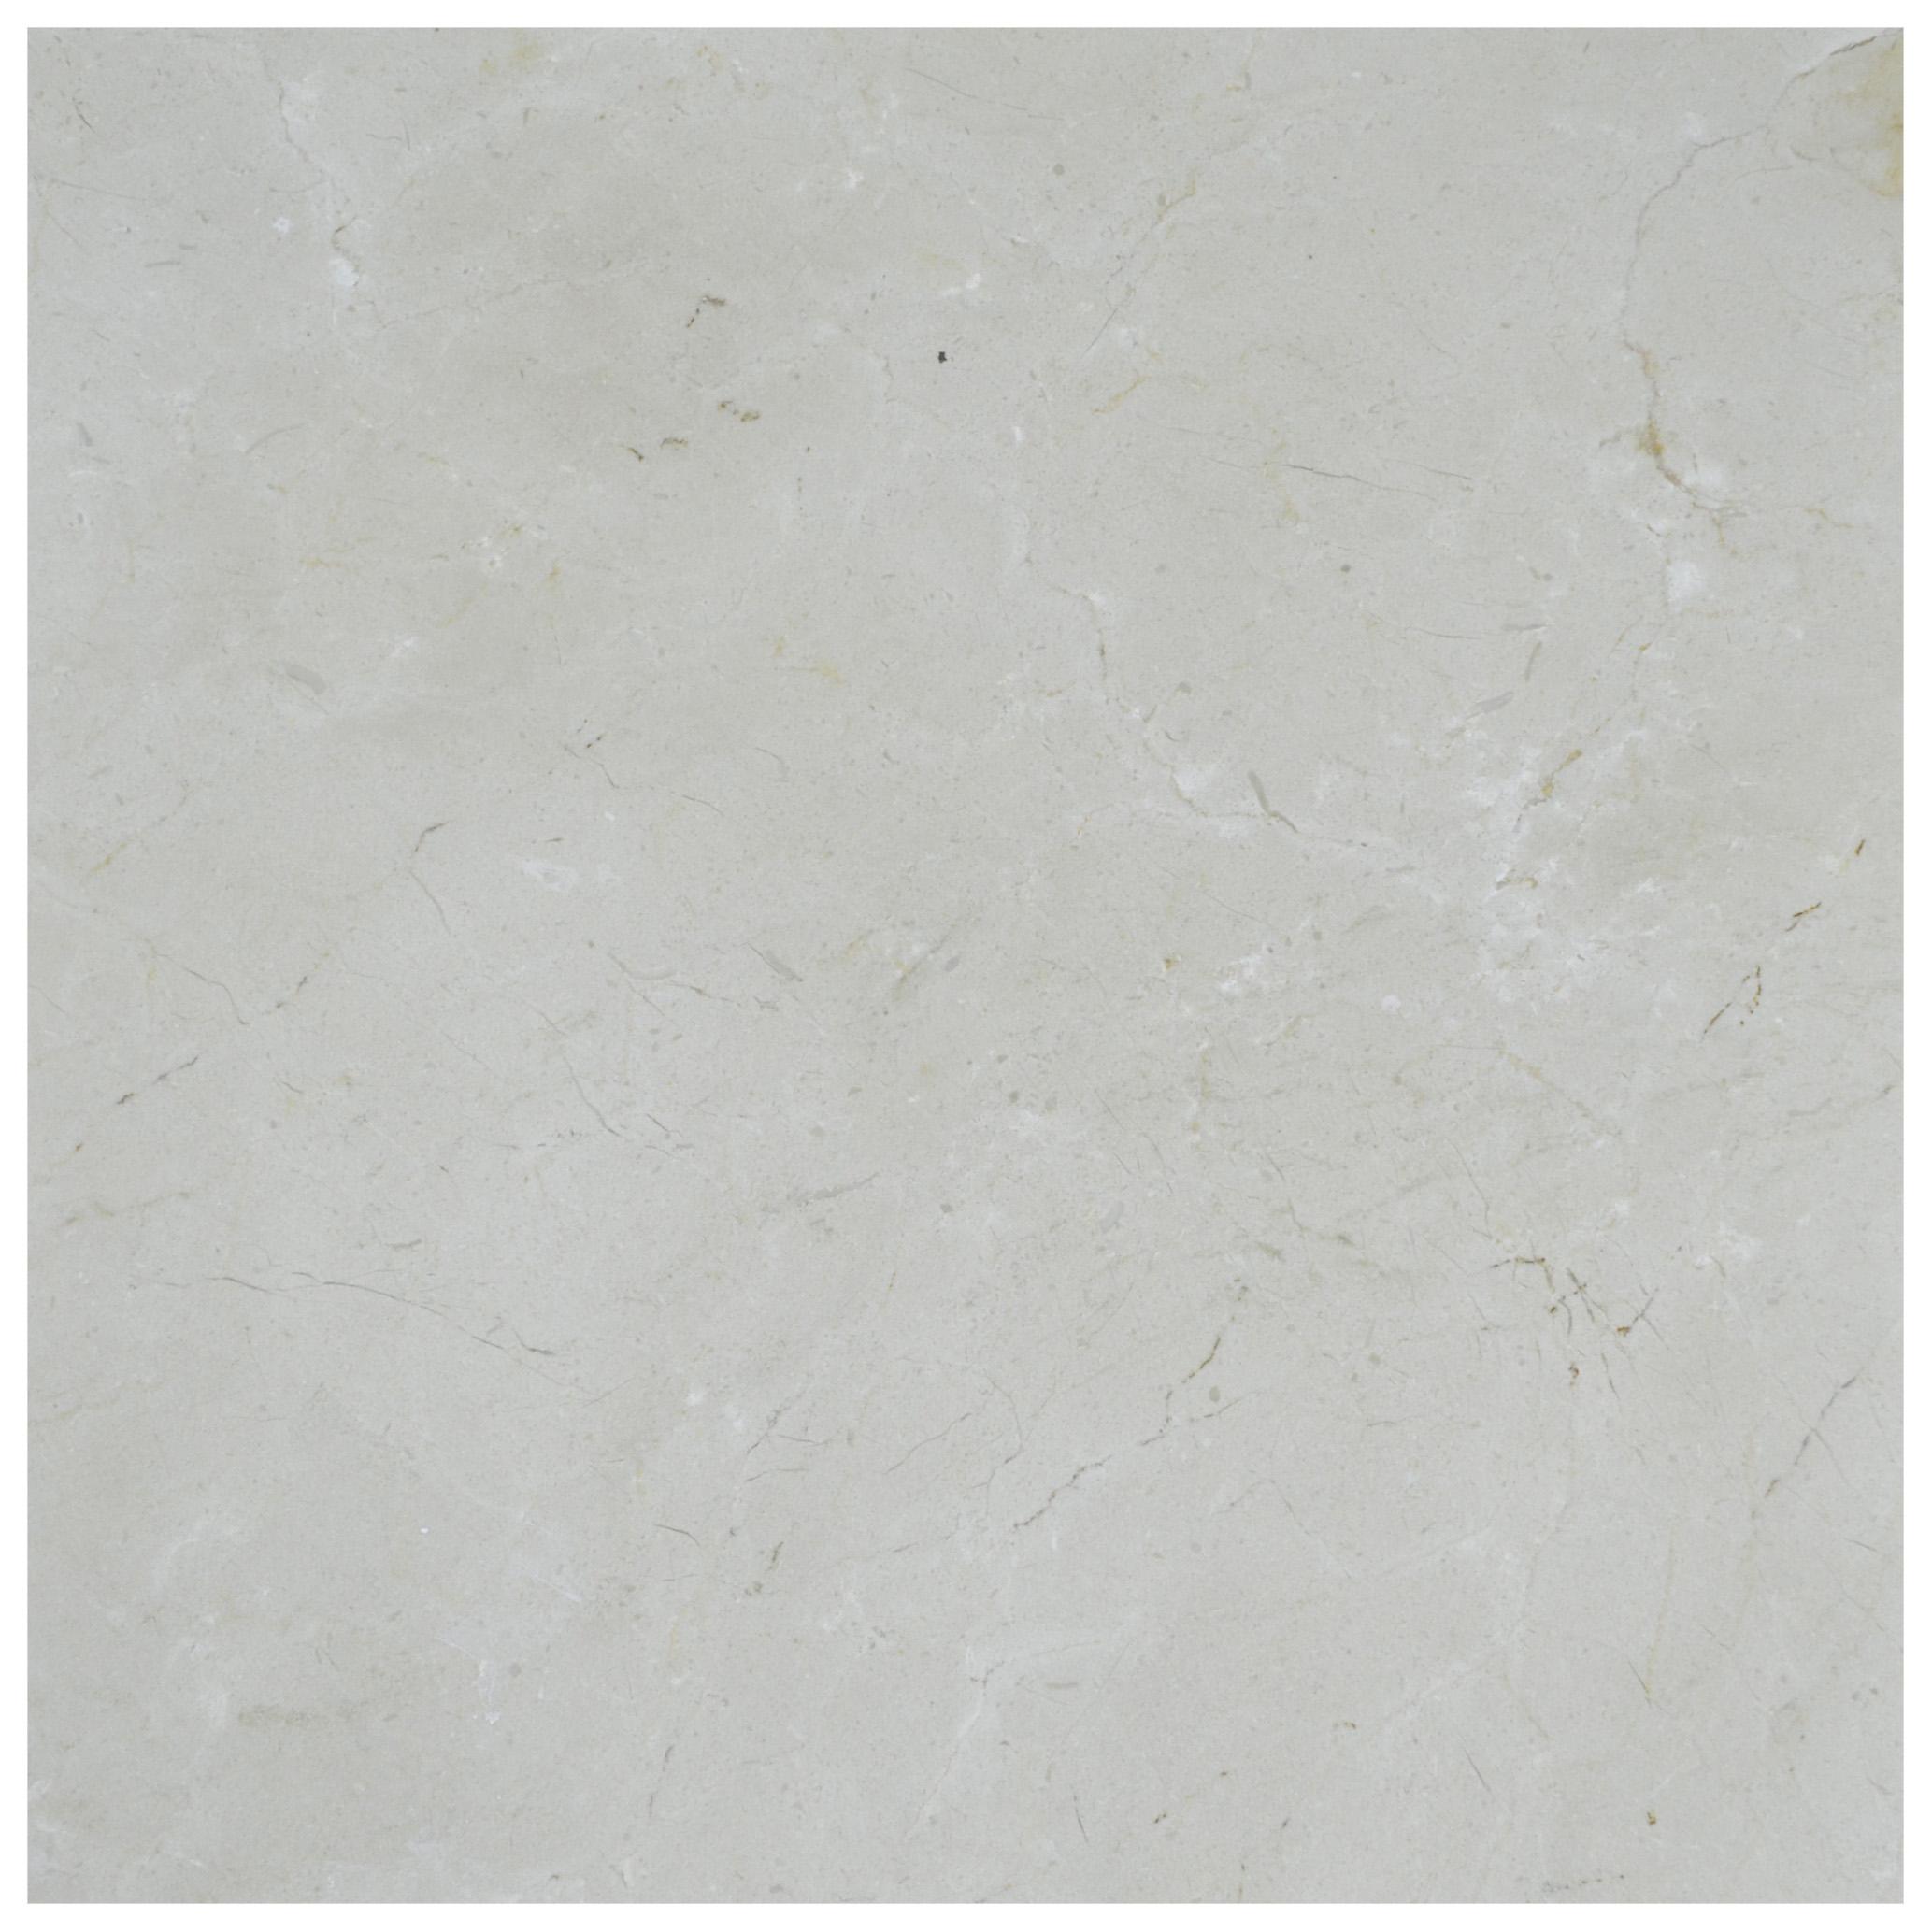 Cream Marfil Standard Polished Marble Tiles 24x24-marble sale-Atlantic Stone Source